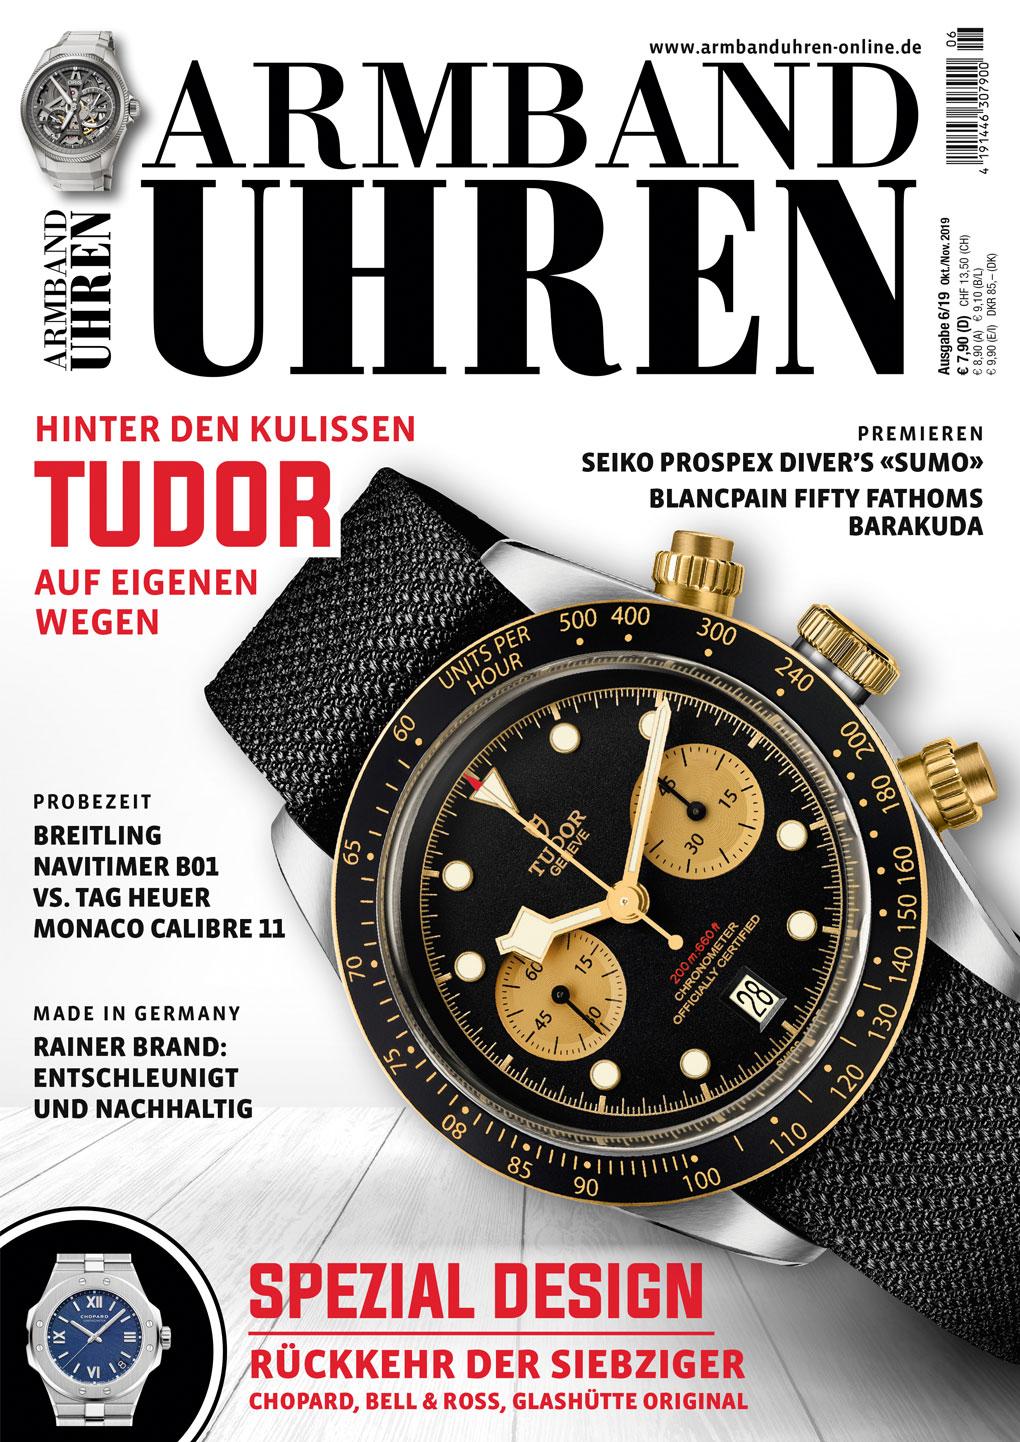 Armbanduhren_Cover_Ausgabe6_2019